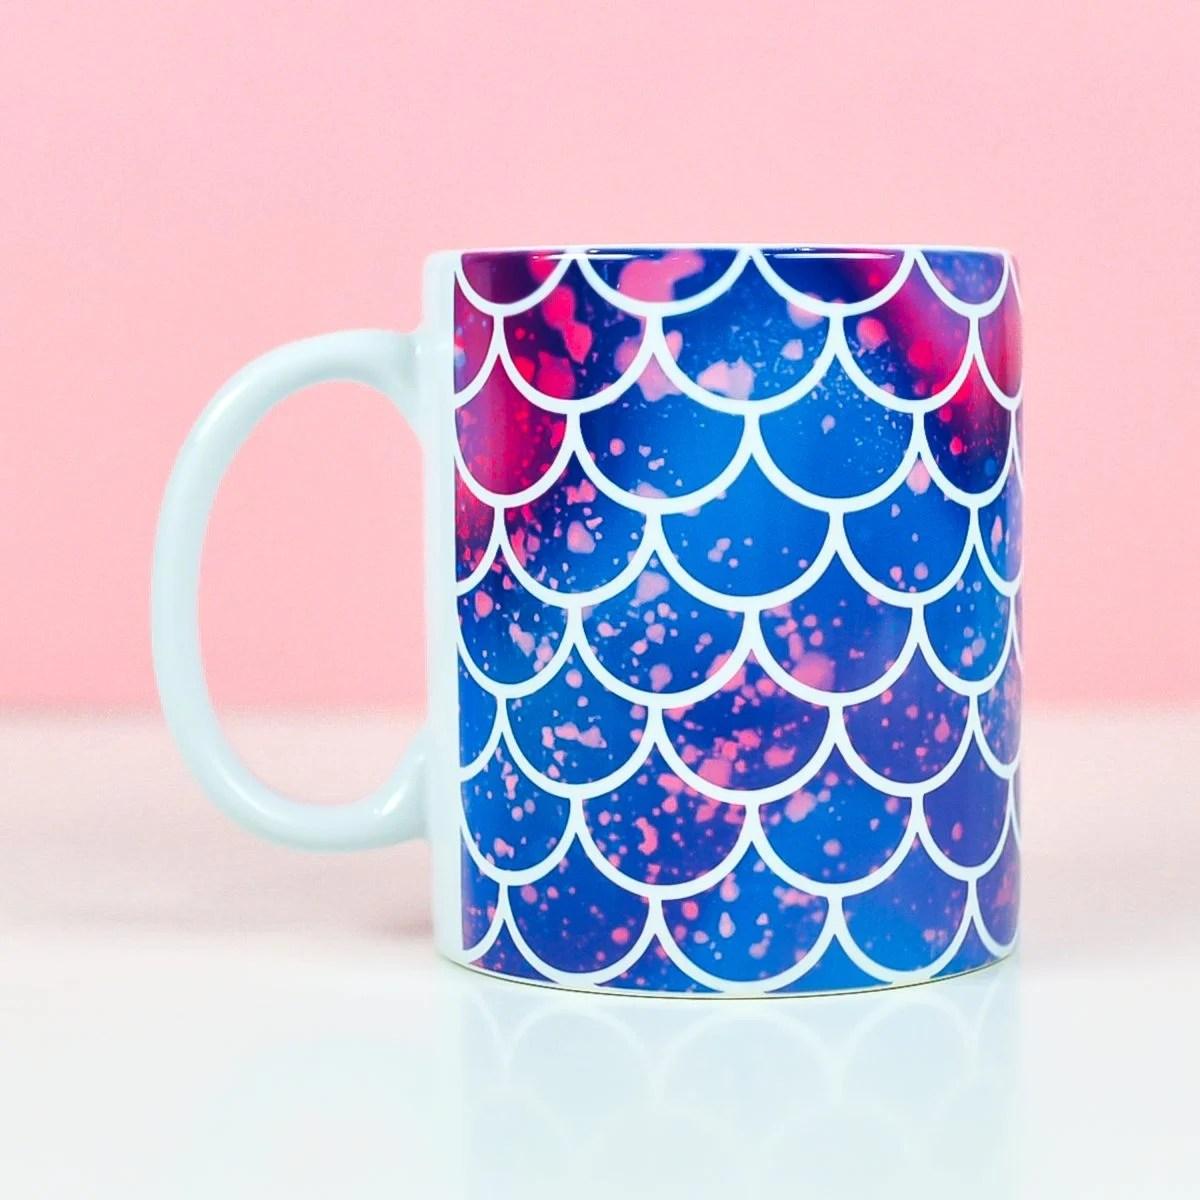 Mermaid mug on pink background made with mermaid mug wrap design